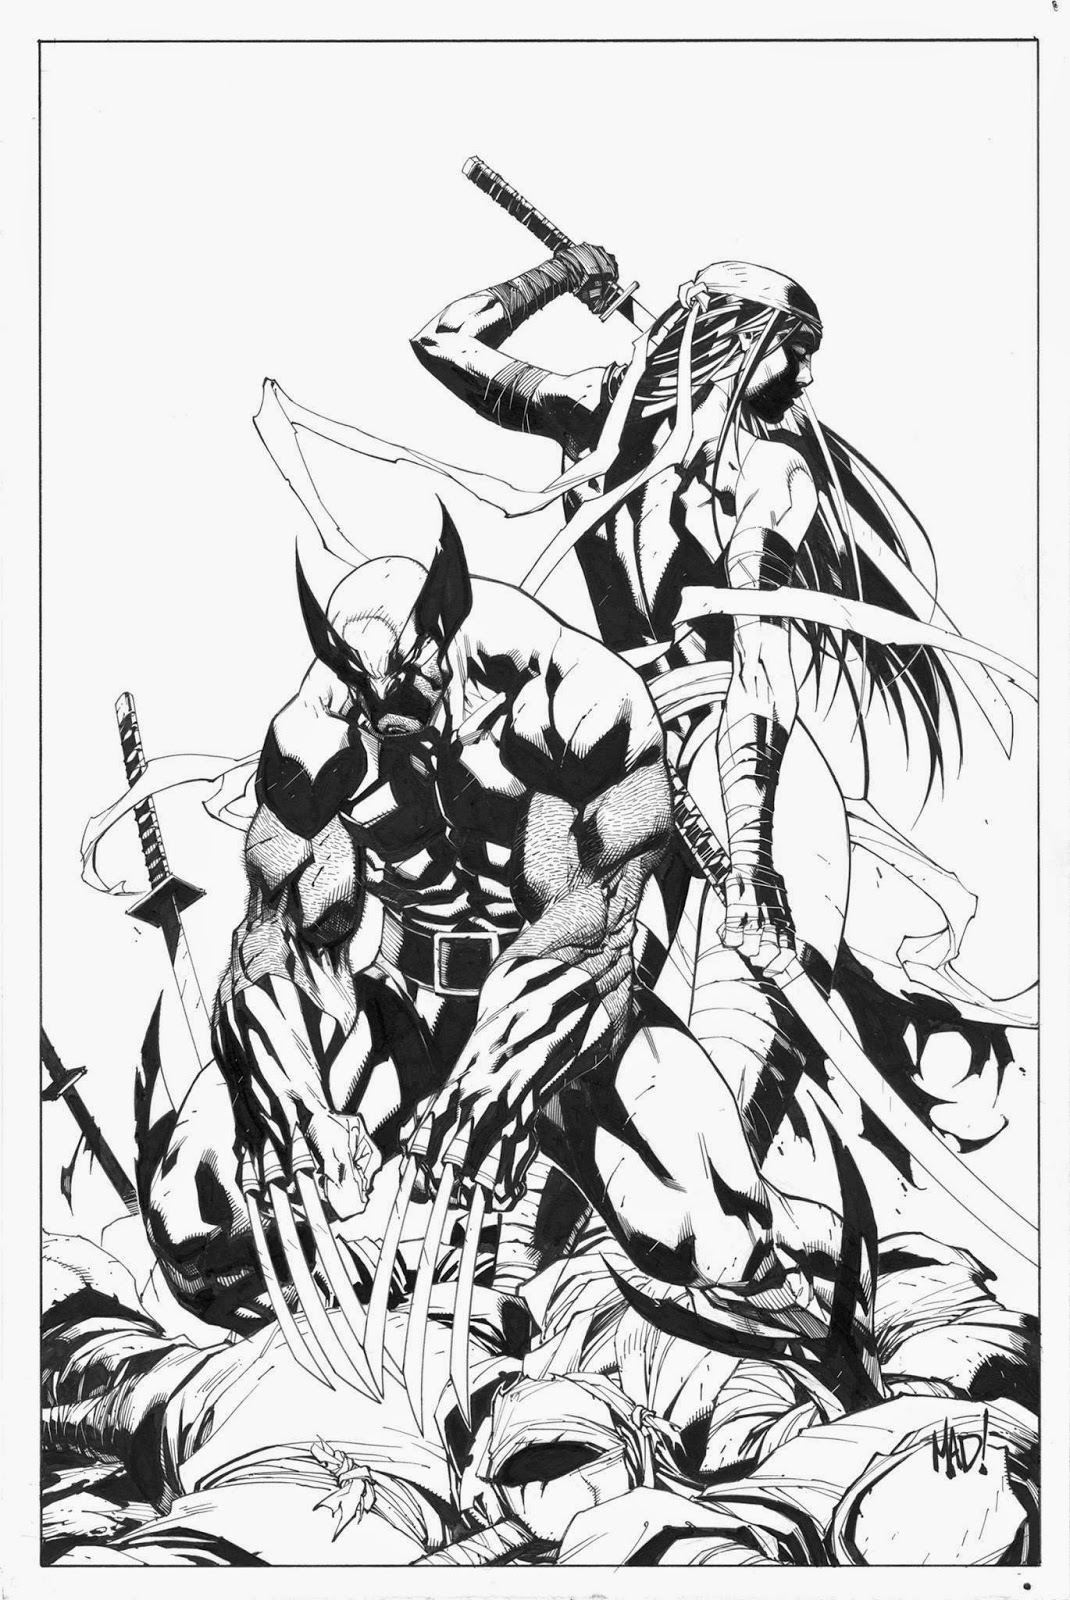 1070x1600 Joe Madureira ! Fansite Joe To Draw Variant Cover To X Men